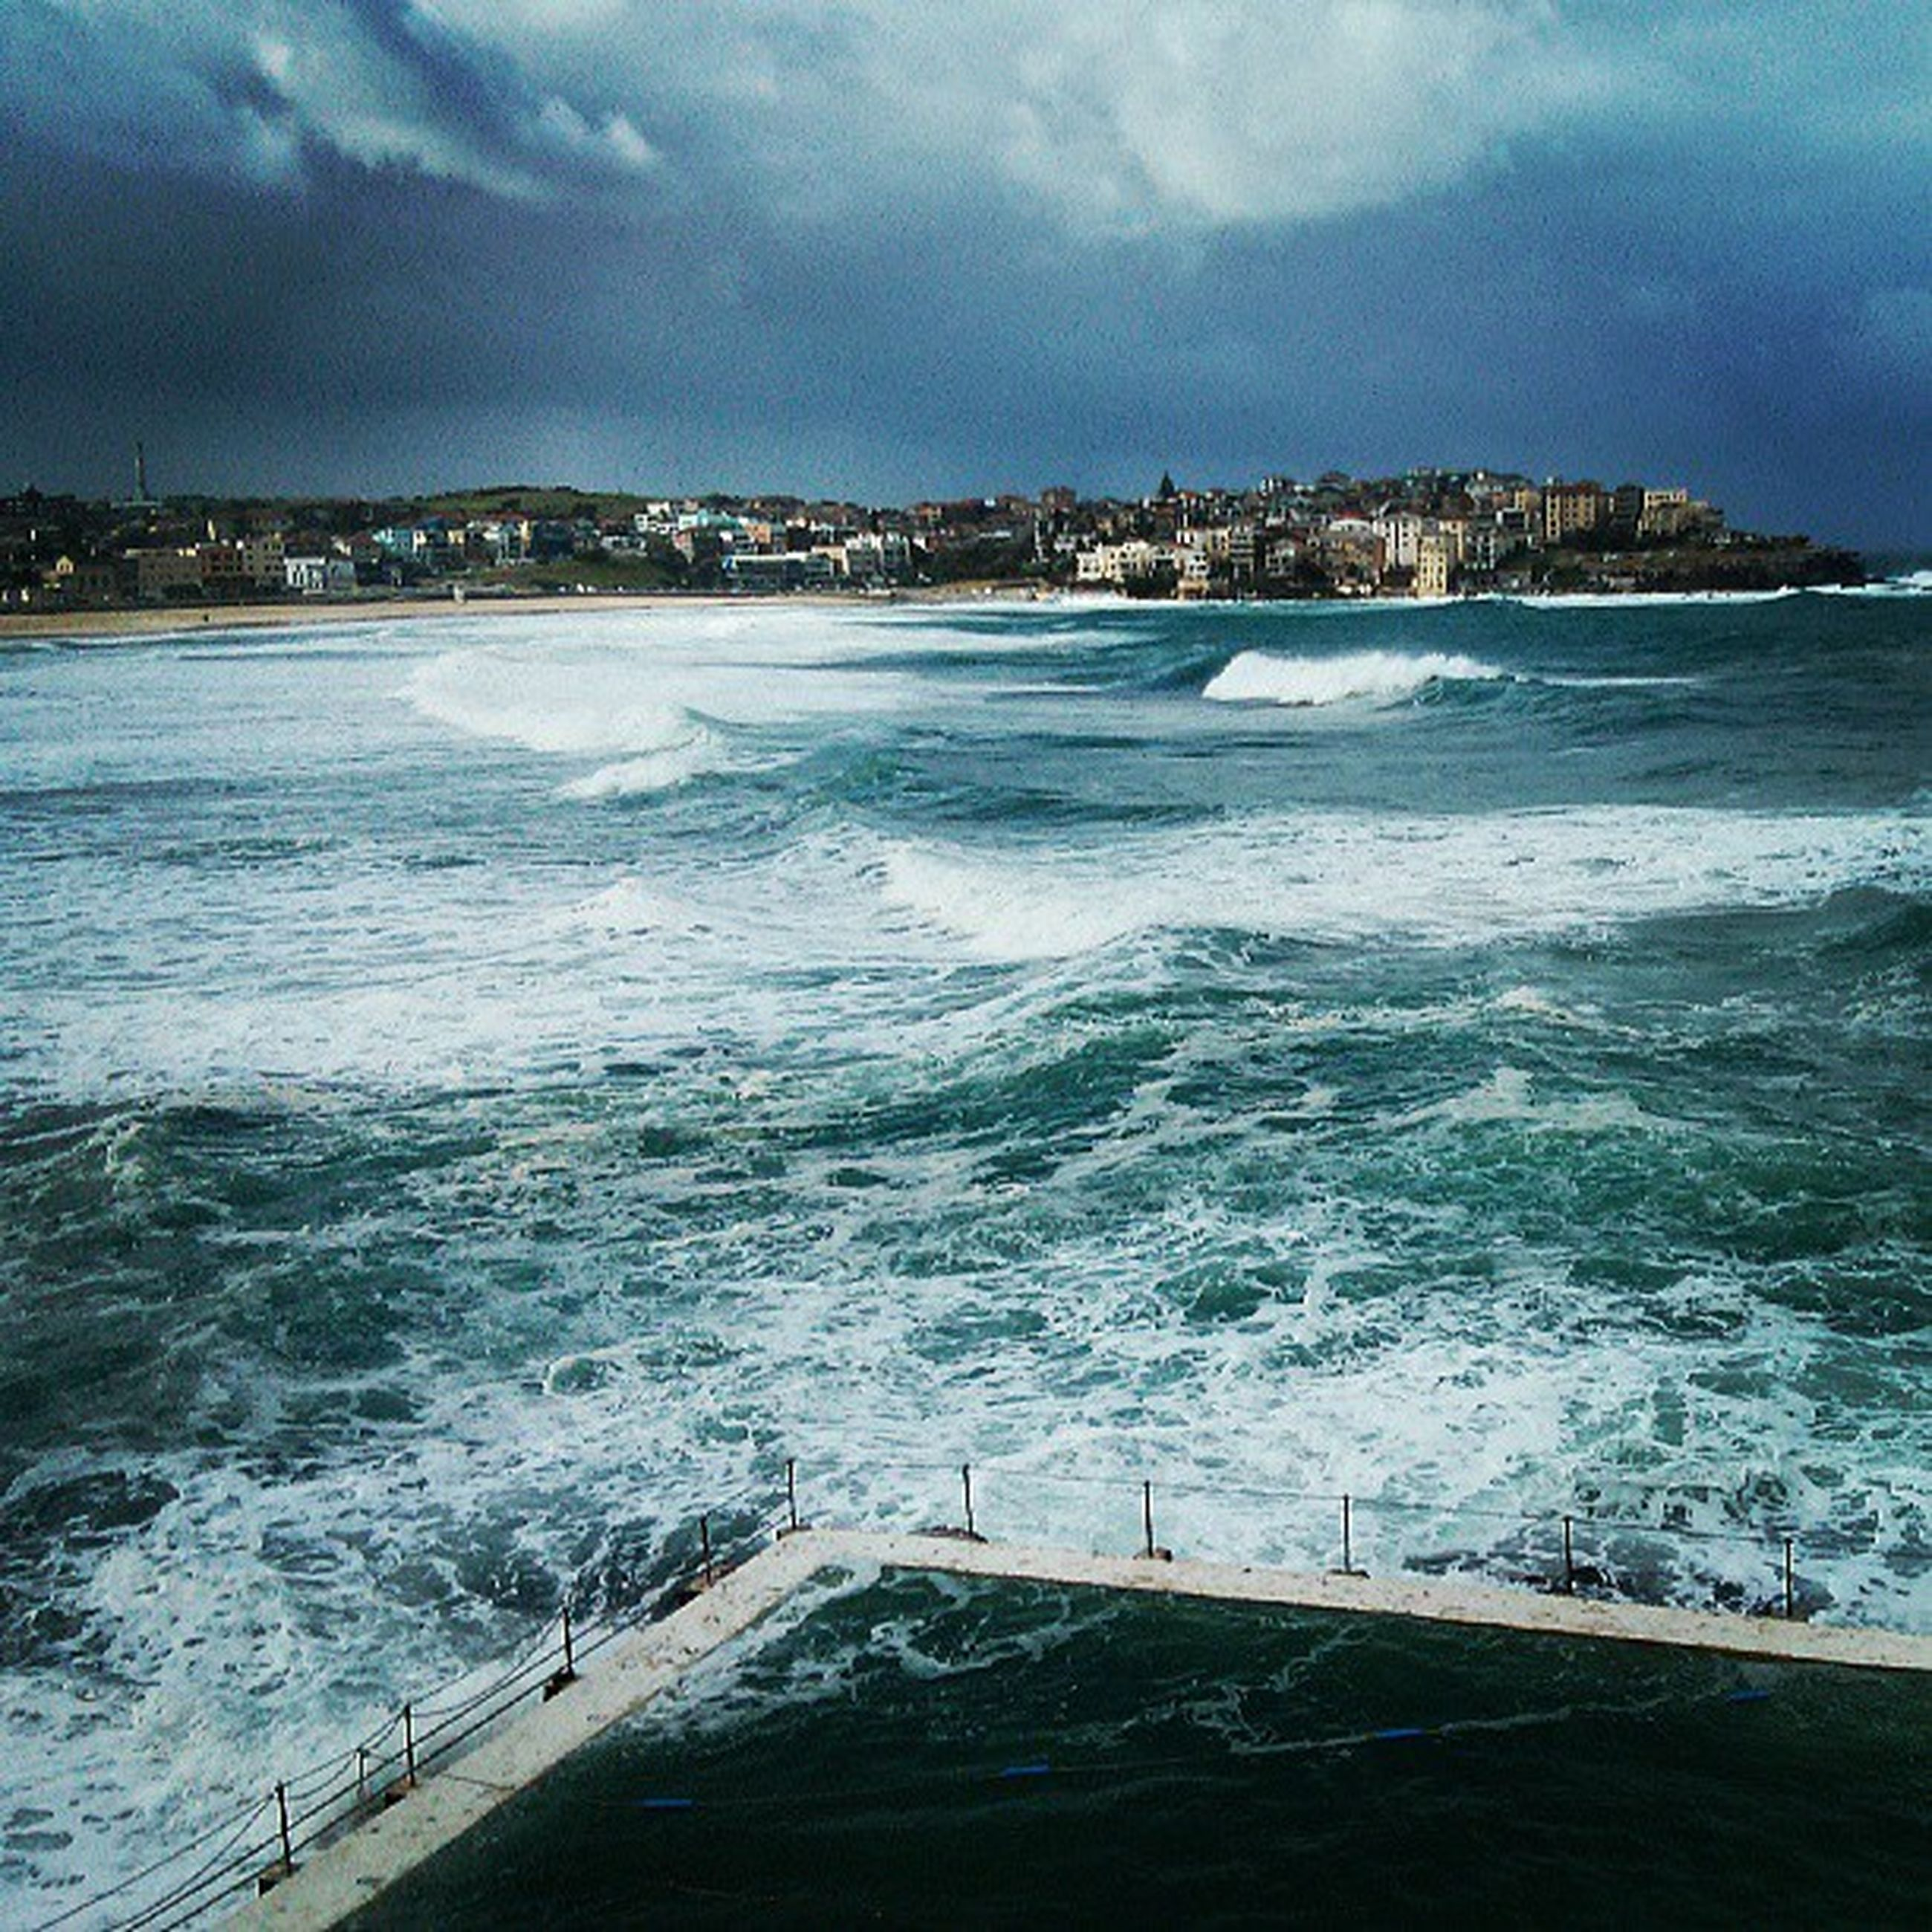 water, sea, sky, wave, building exterior, cloud - sky, surf, architecture, built structure, beach, scenics, beauty in nature, nature, blue, cloudy, shore, cloud, coastline, waterfront, motion